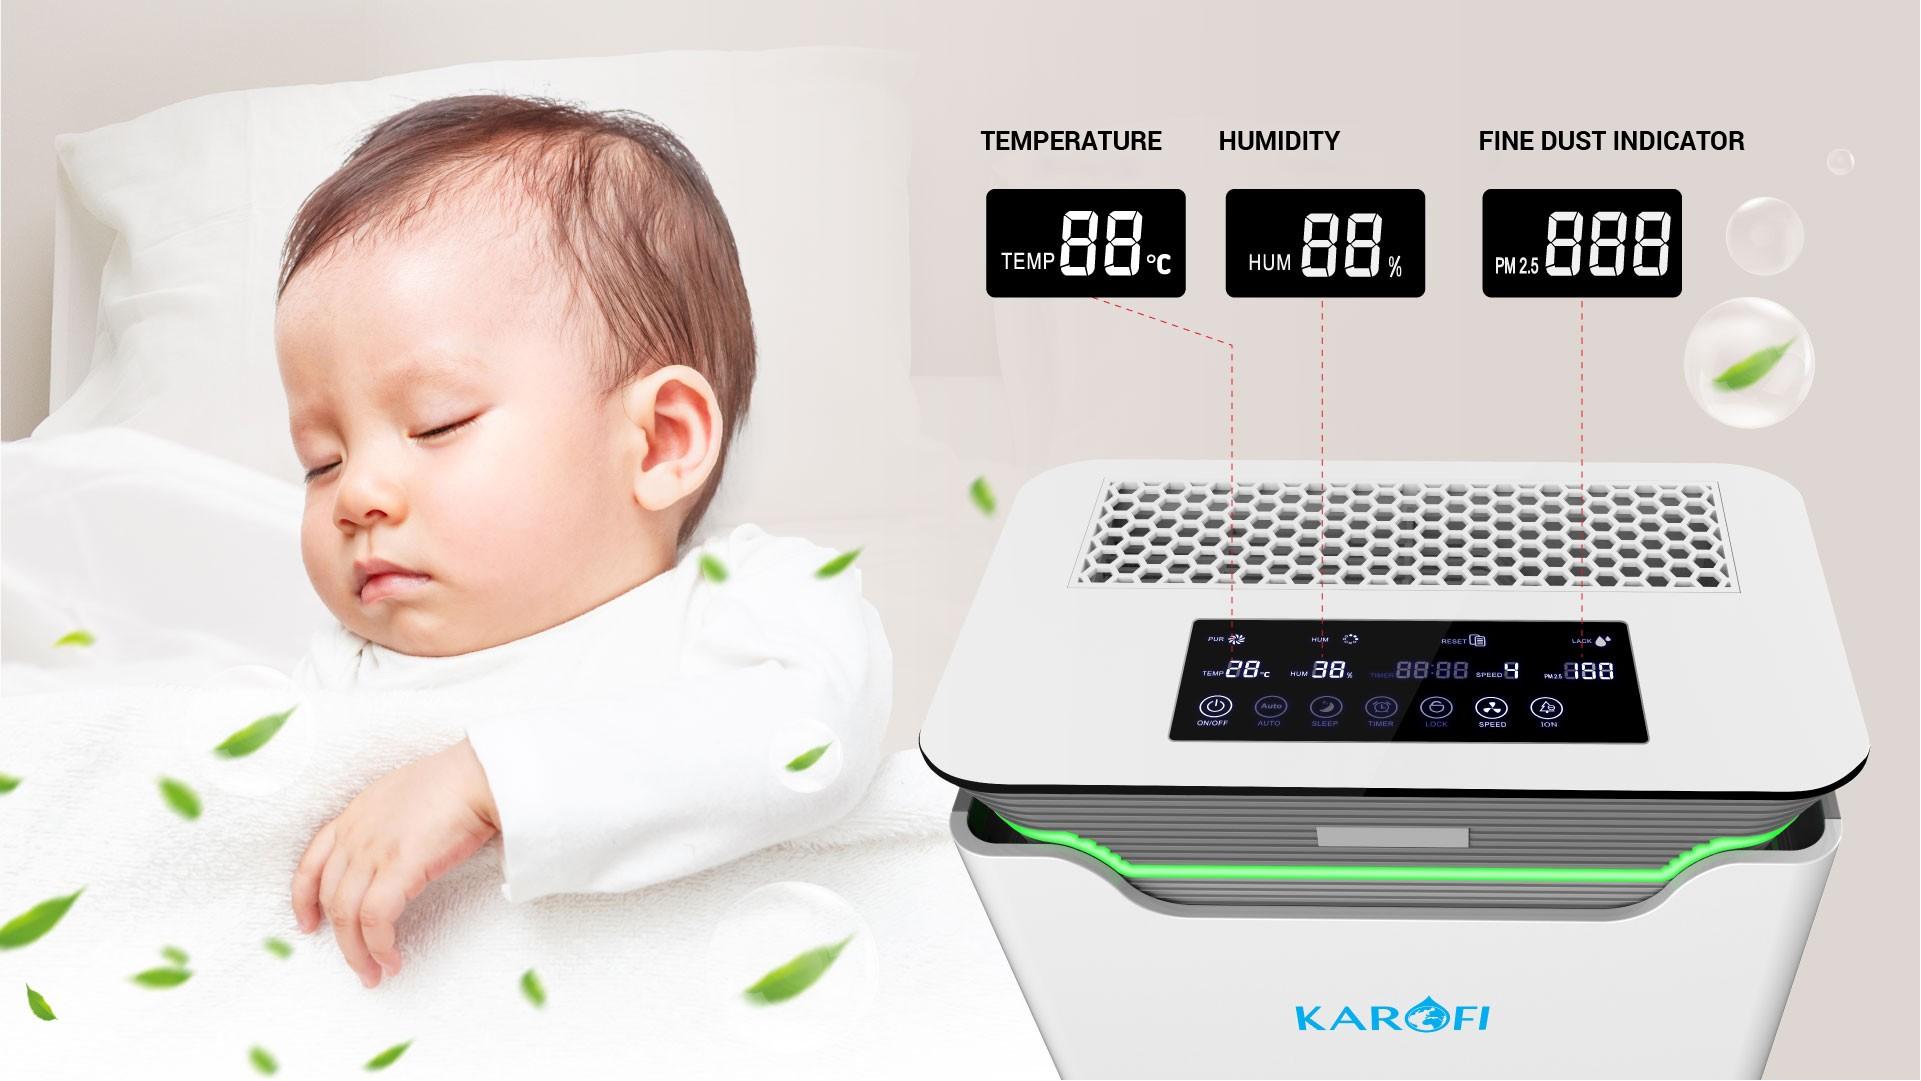 karofi-kap-317-smart-air-filter-3